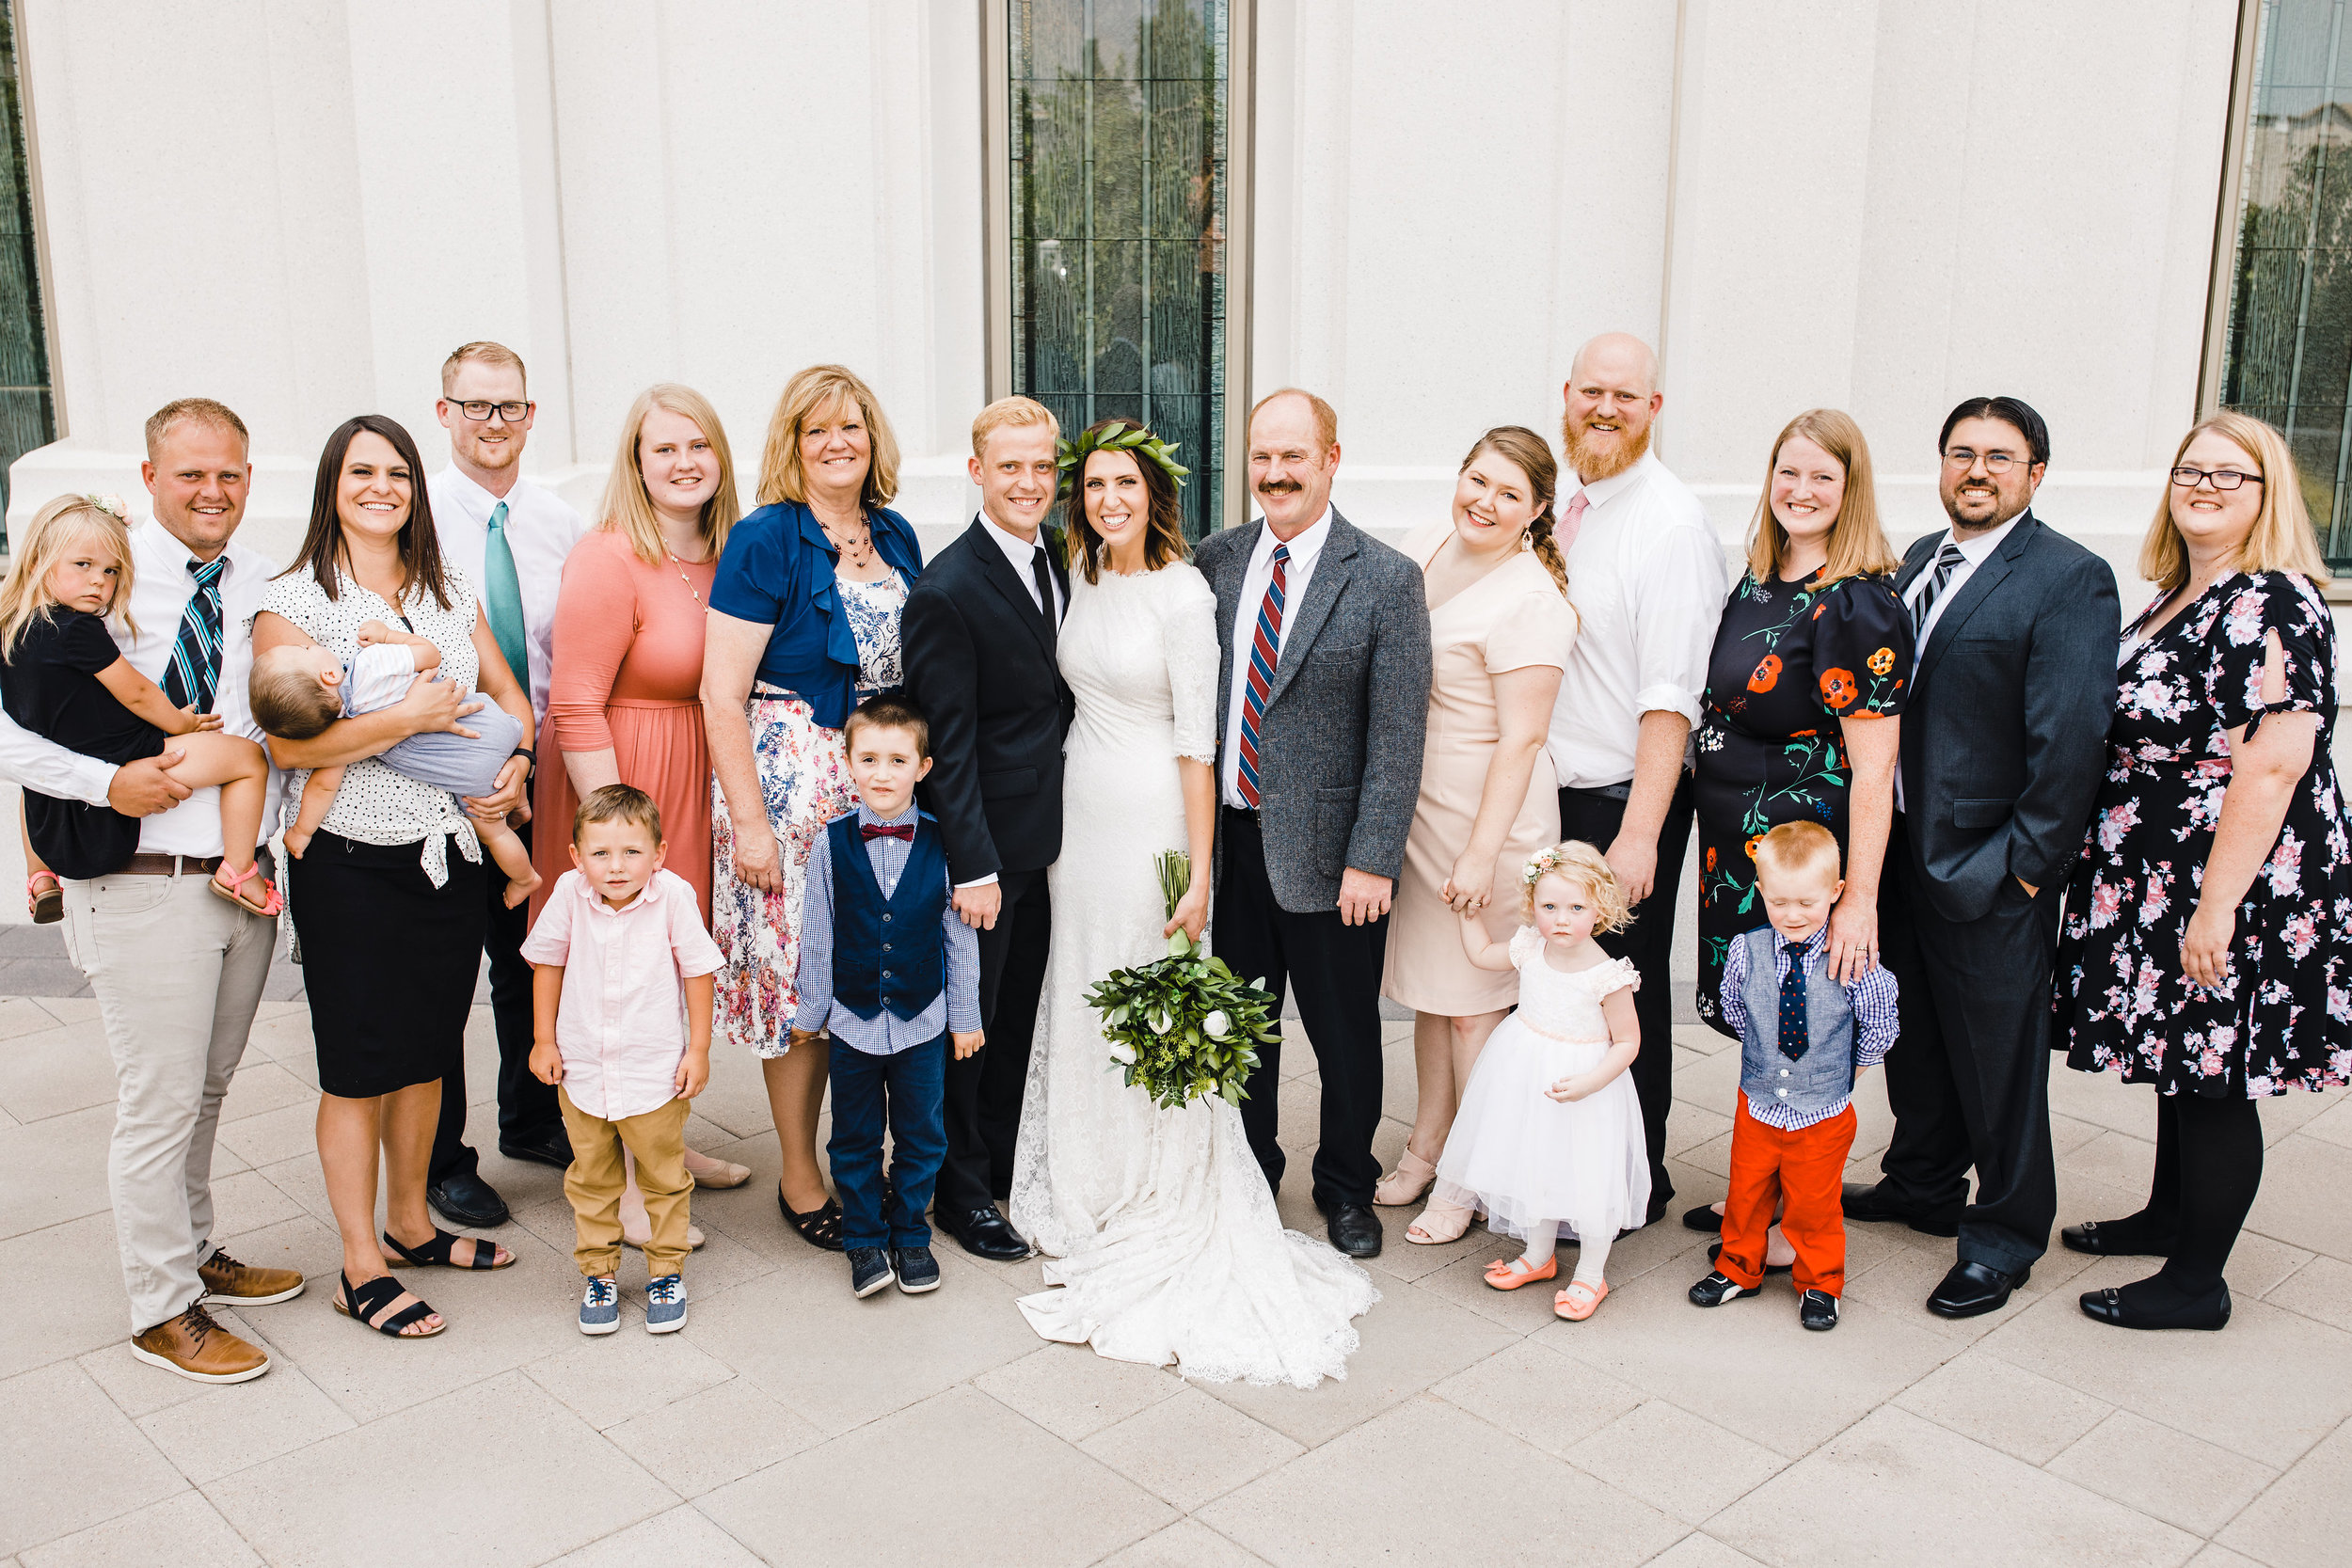 brigham city wedding photographer family photos floral crown temple lds